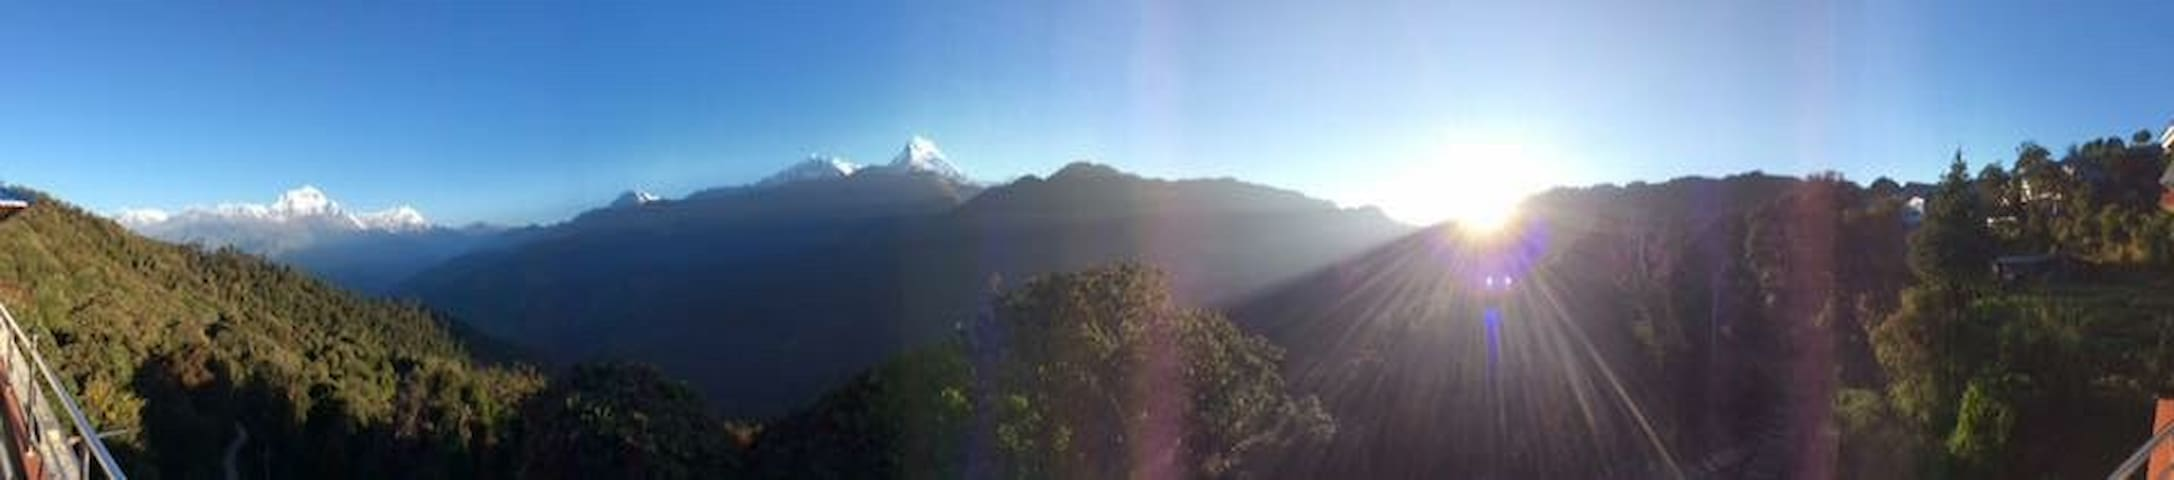 Asha Hotel & Restaurant Ghorepani, Poon Hill Nepal